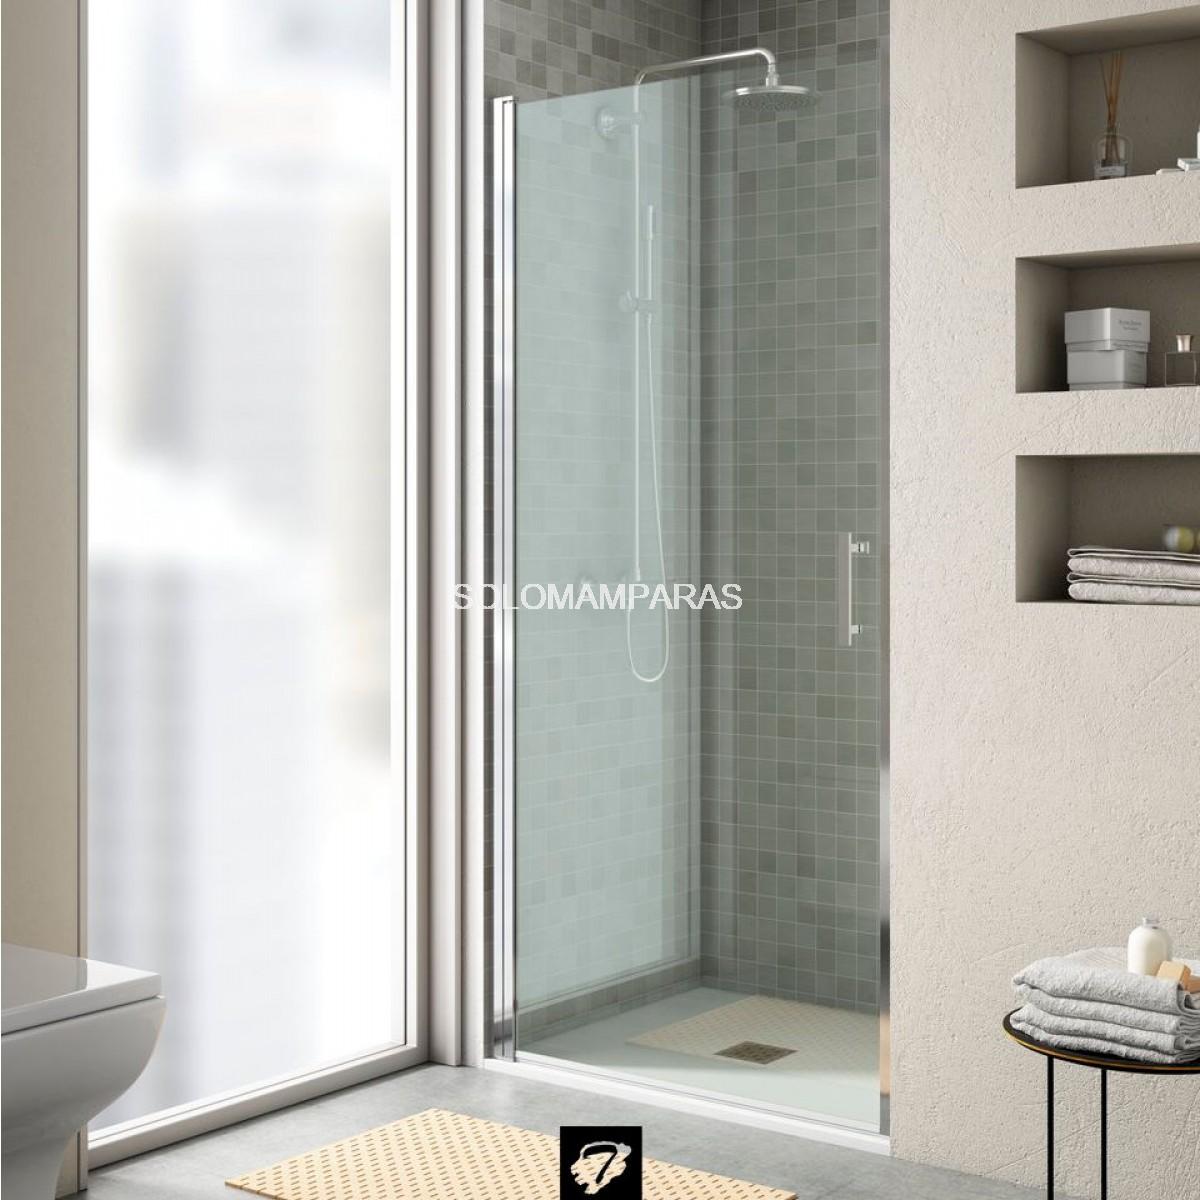 Mampara ducha 1puerta abatible cromo sin perfil - Mamparas de ducha sin perfiles ...